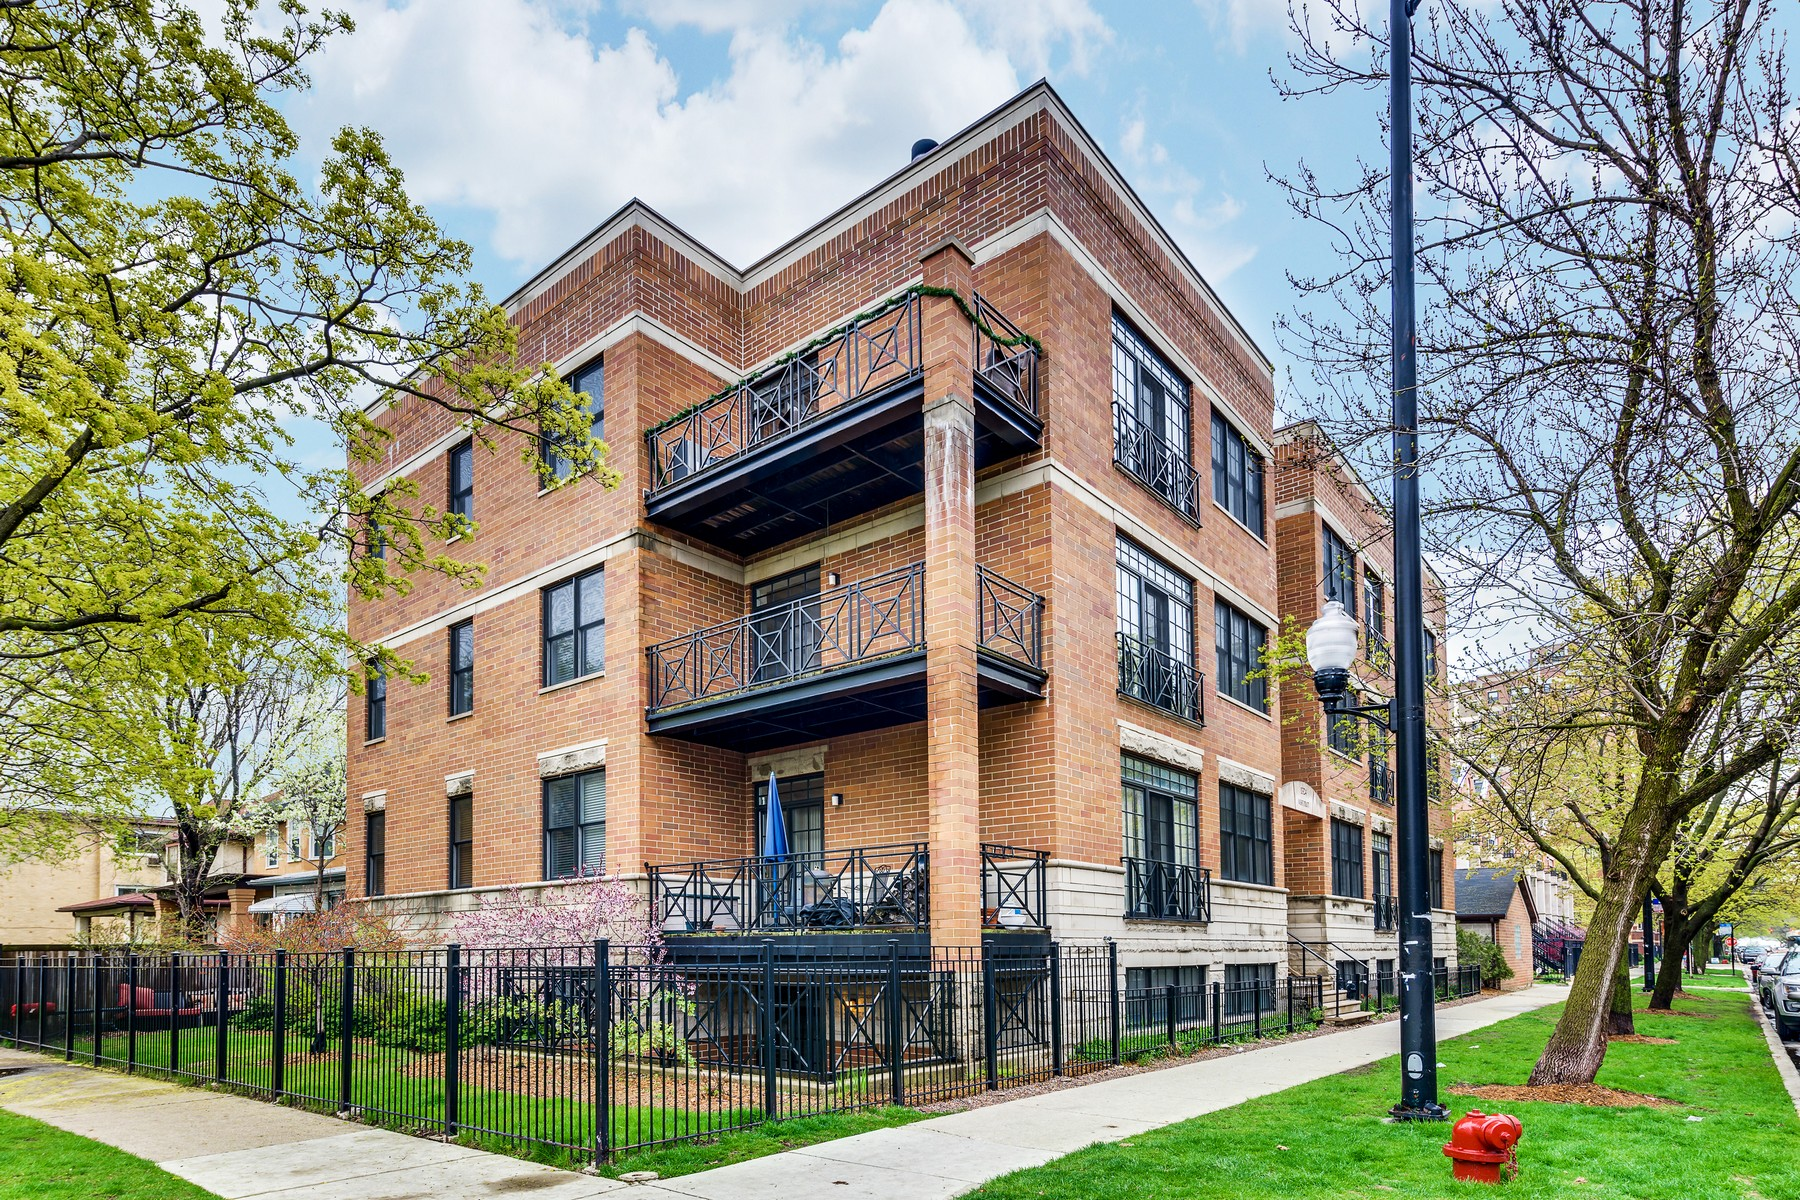 Condominium for Sale at A+ Rogers Park Location! 1324 W Pratt Boulevard Unit 1W Rogers Park, Chicago, Illinois, 60626 United States